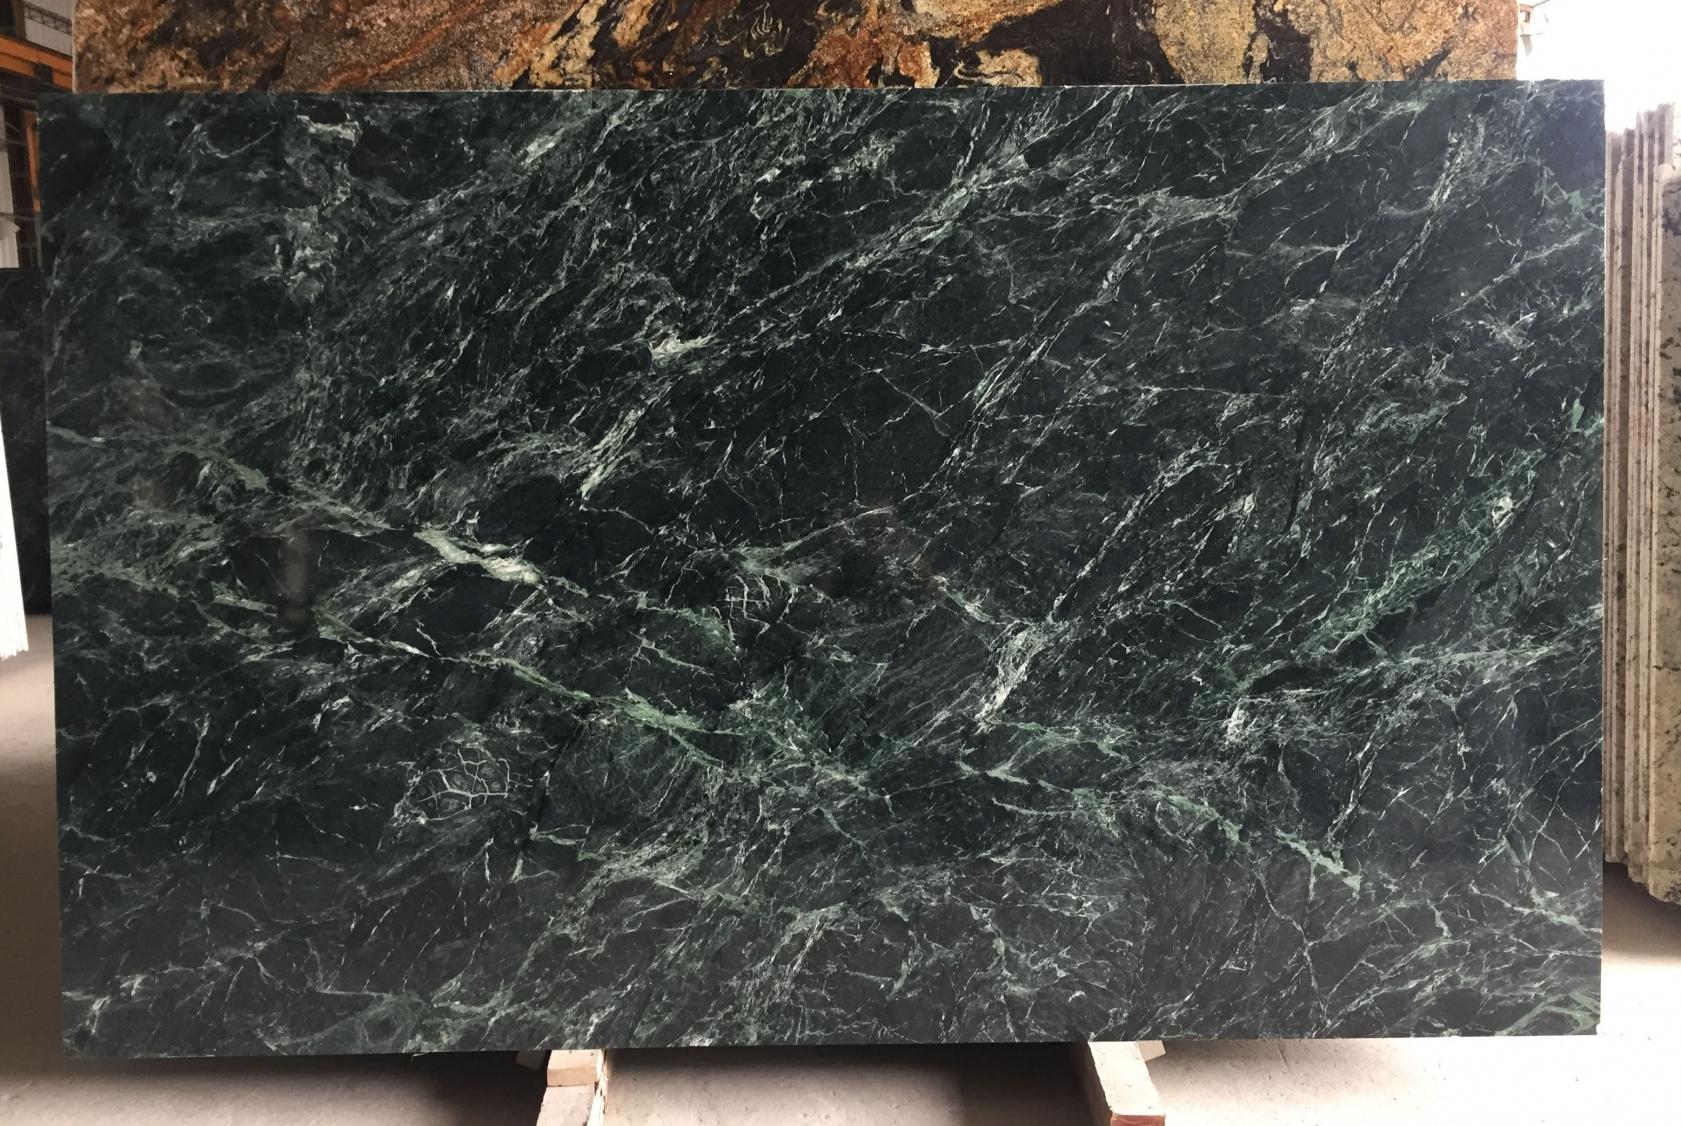 TAIWAN GREEN Suministro (Taiwán) de planchas pulidas en mármol natural TW 2504 , Bundle #4